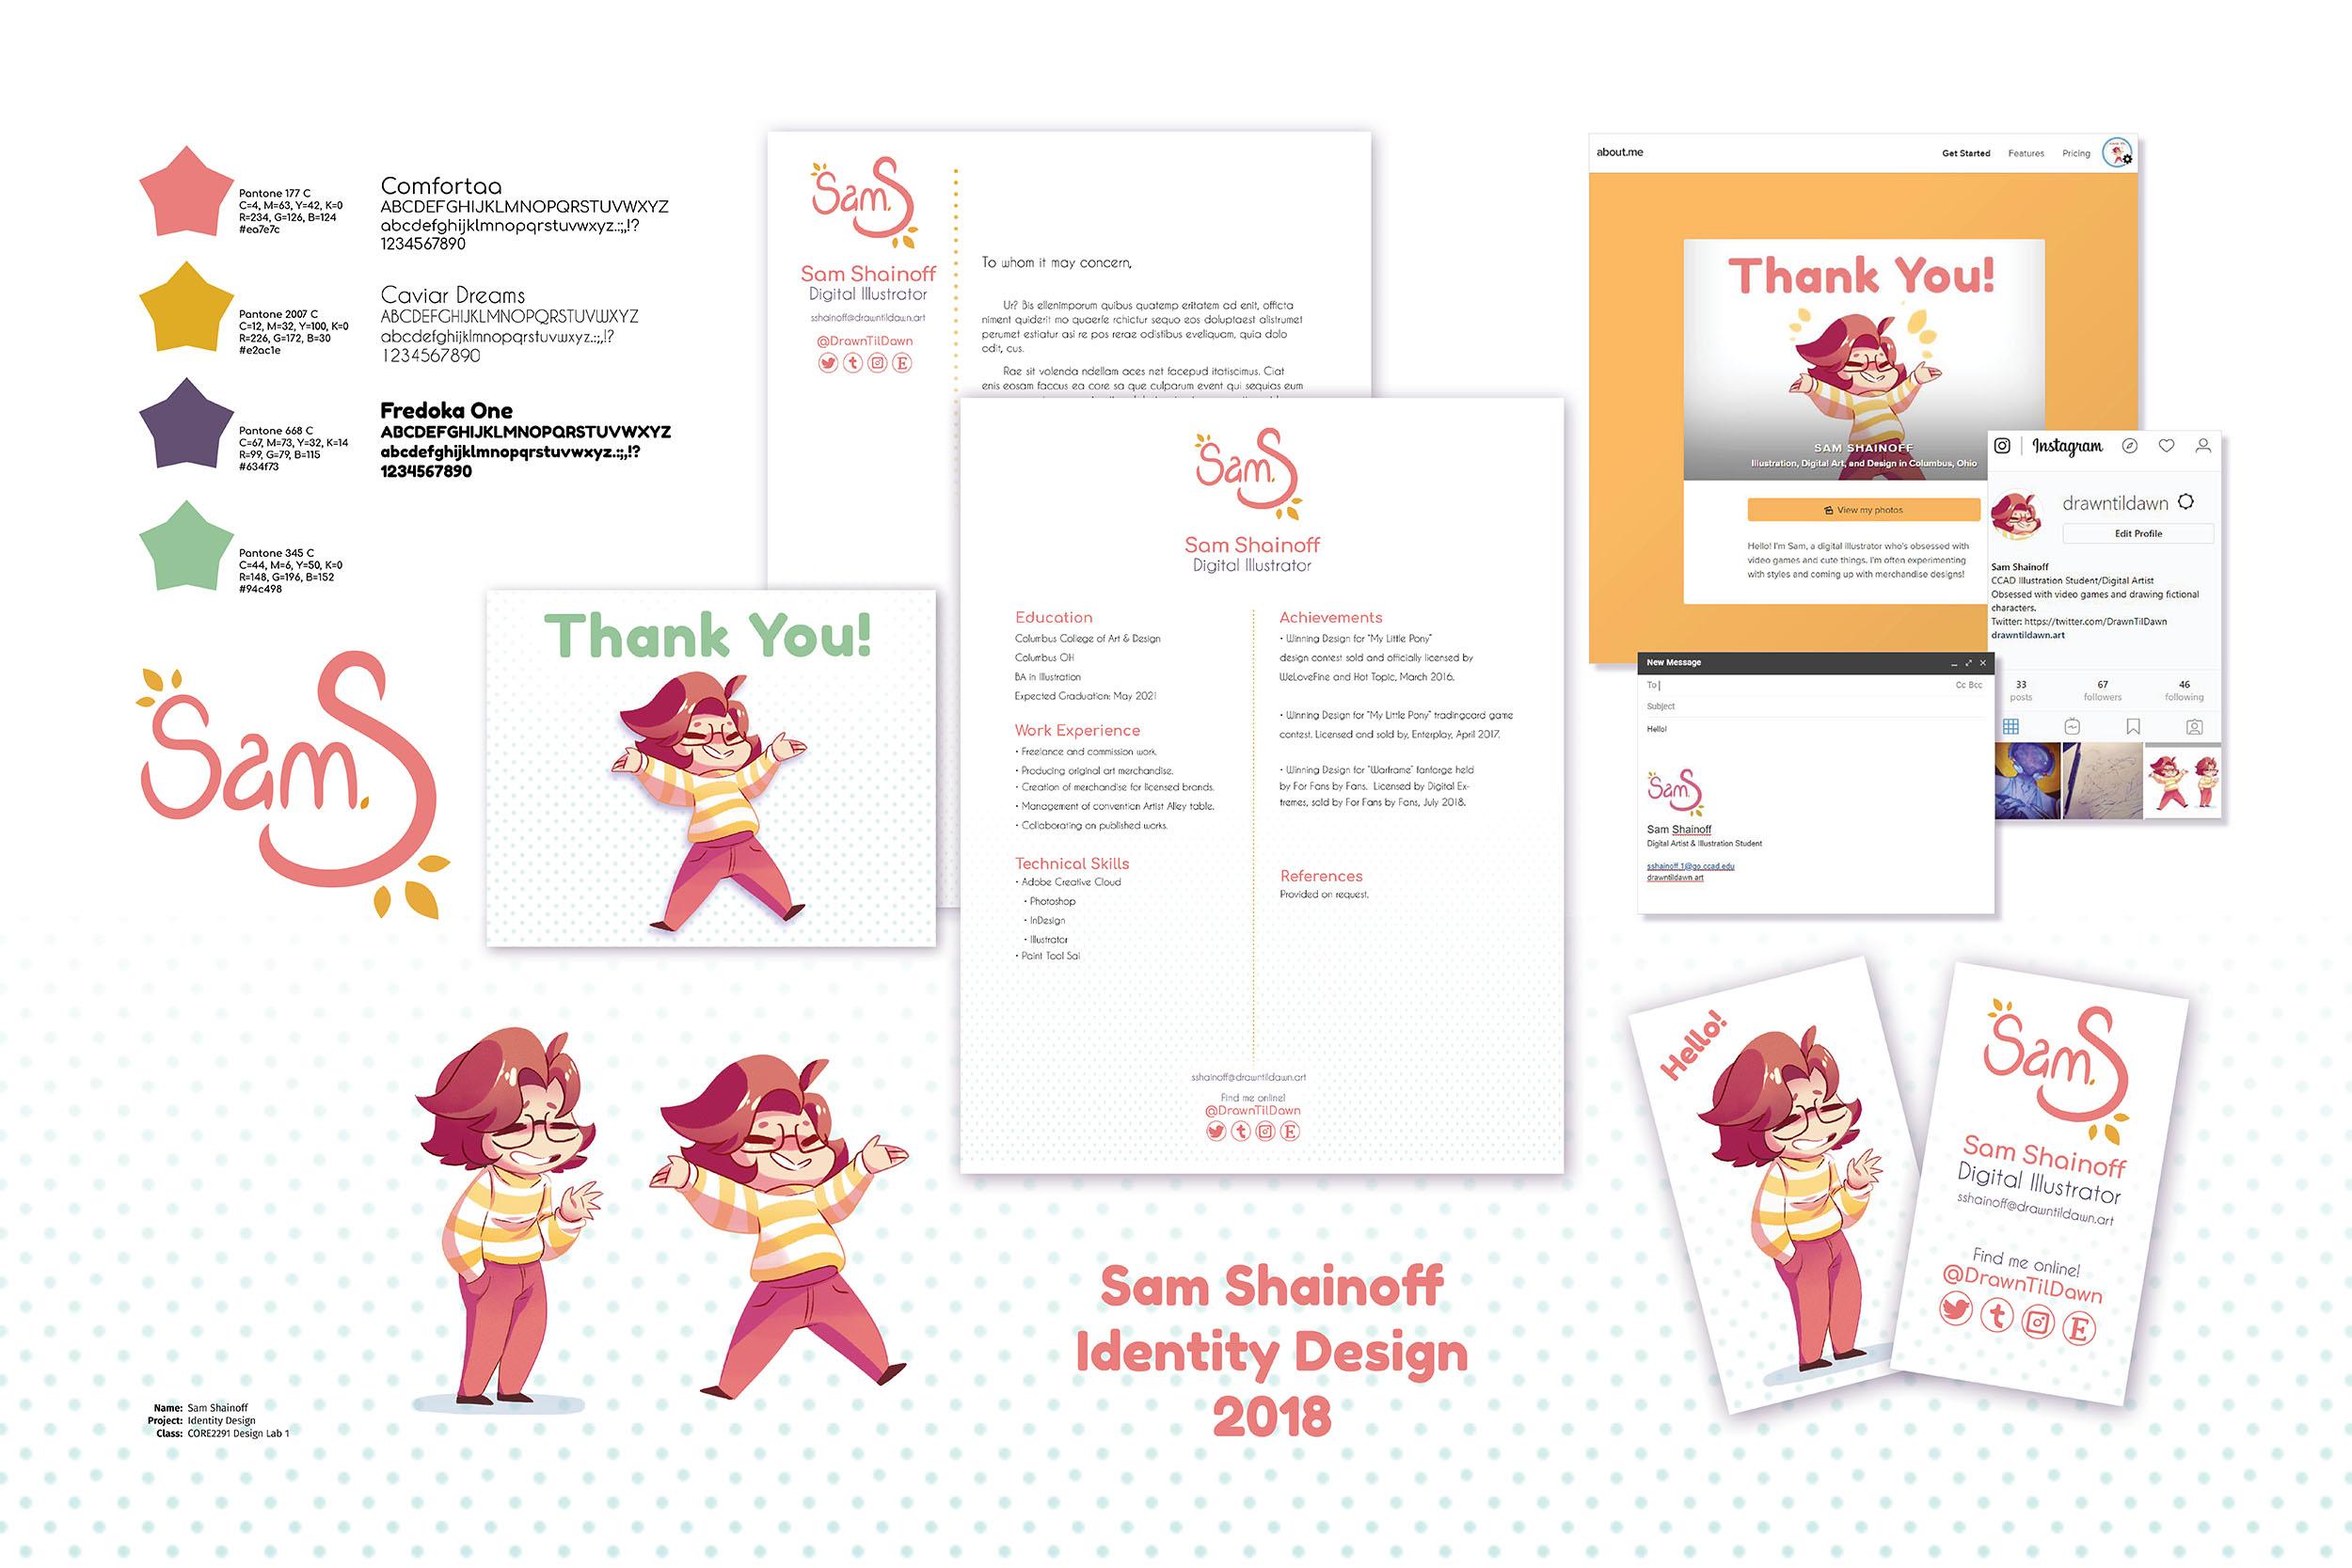 CORE2291_DBennett_Project 6 Brand Board_SamShainoff-v2.jpg